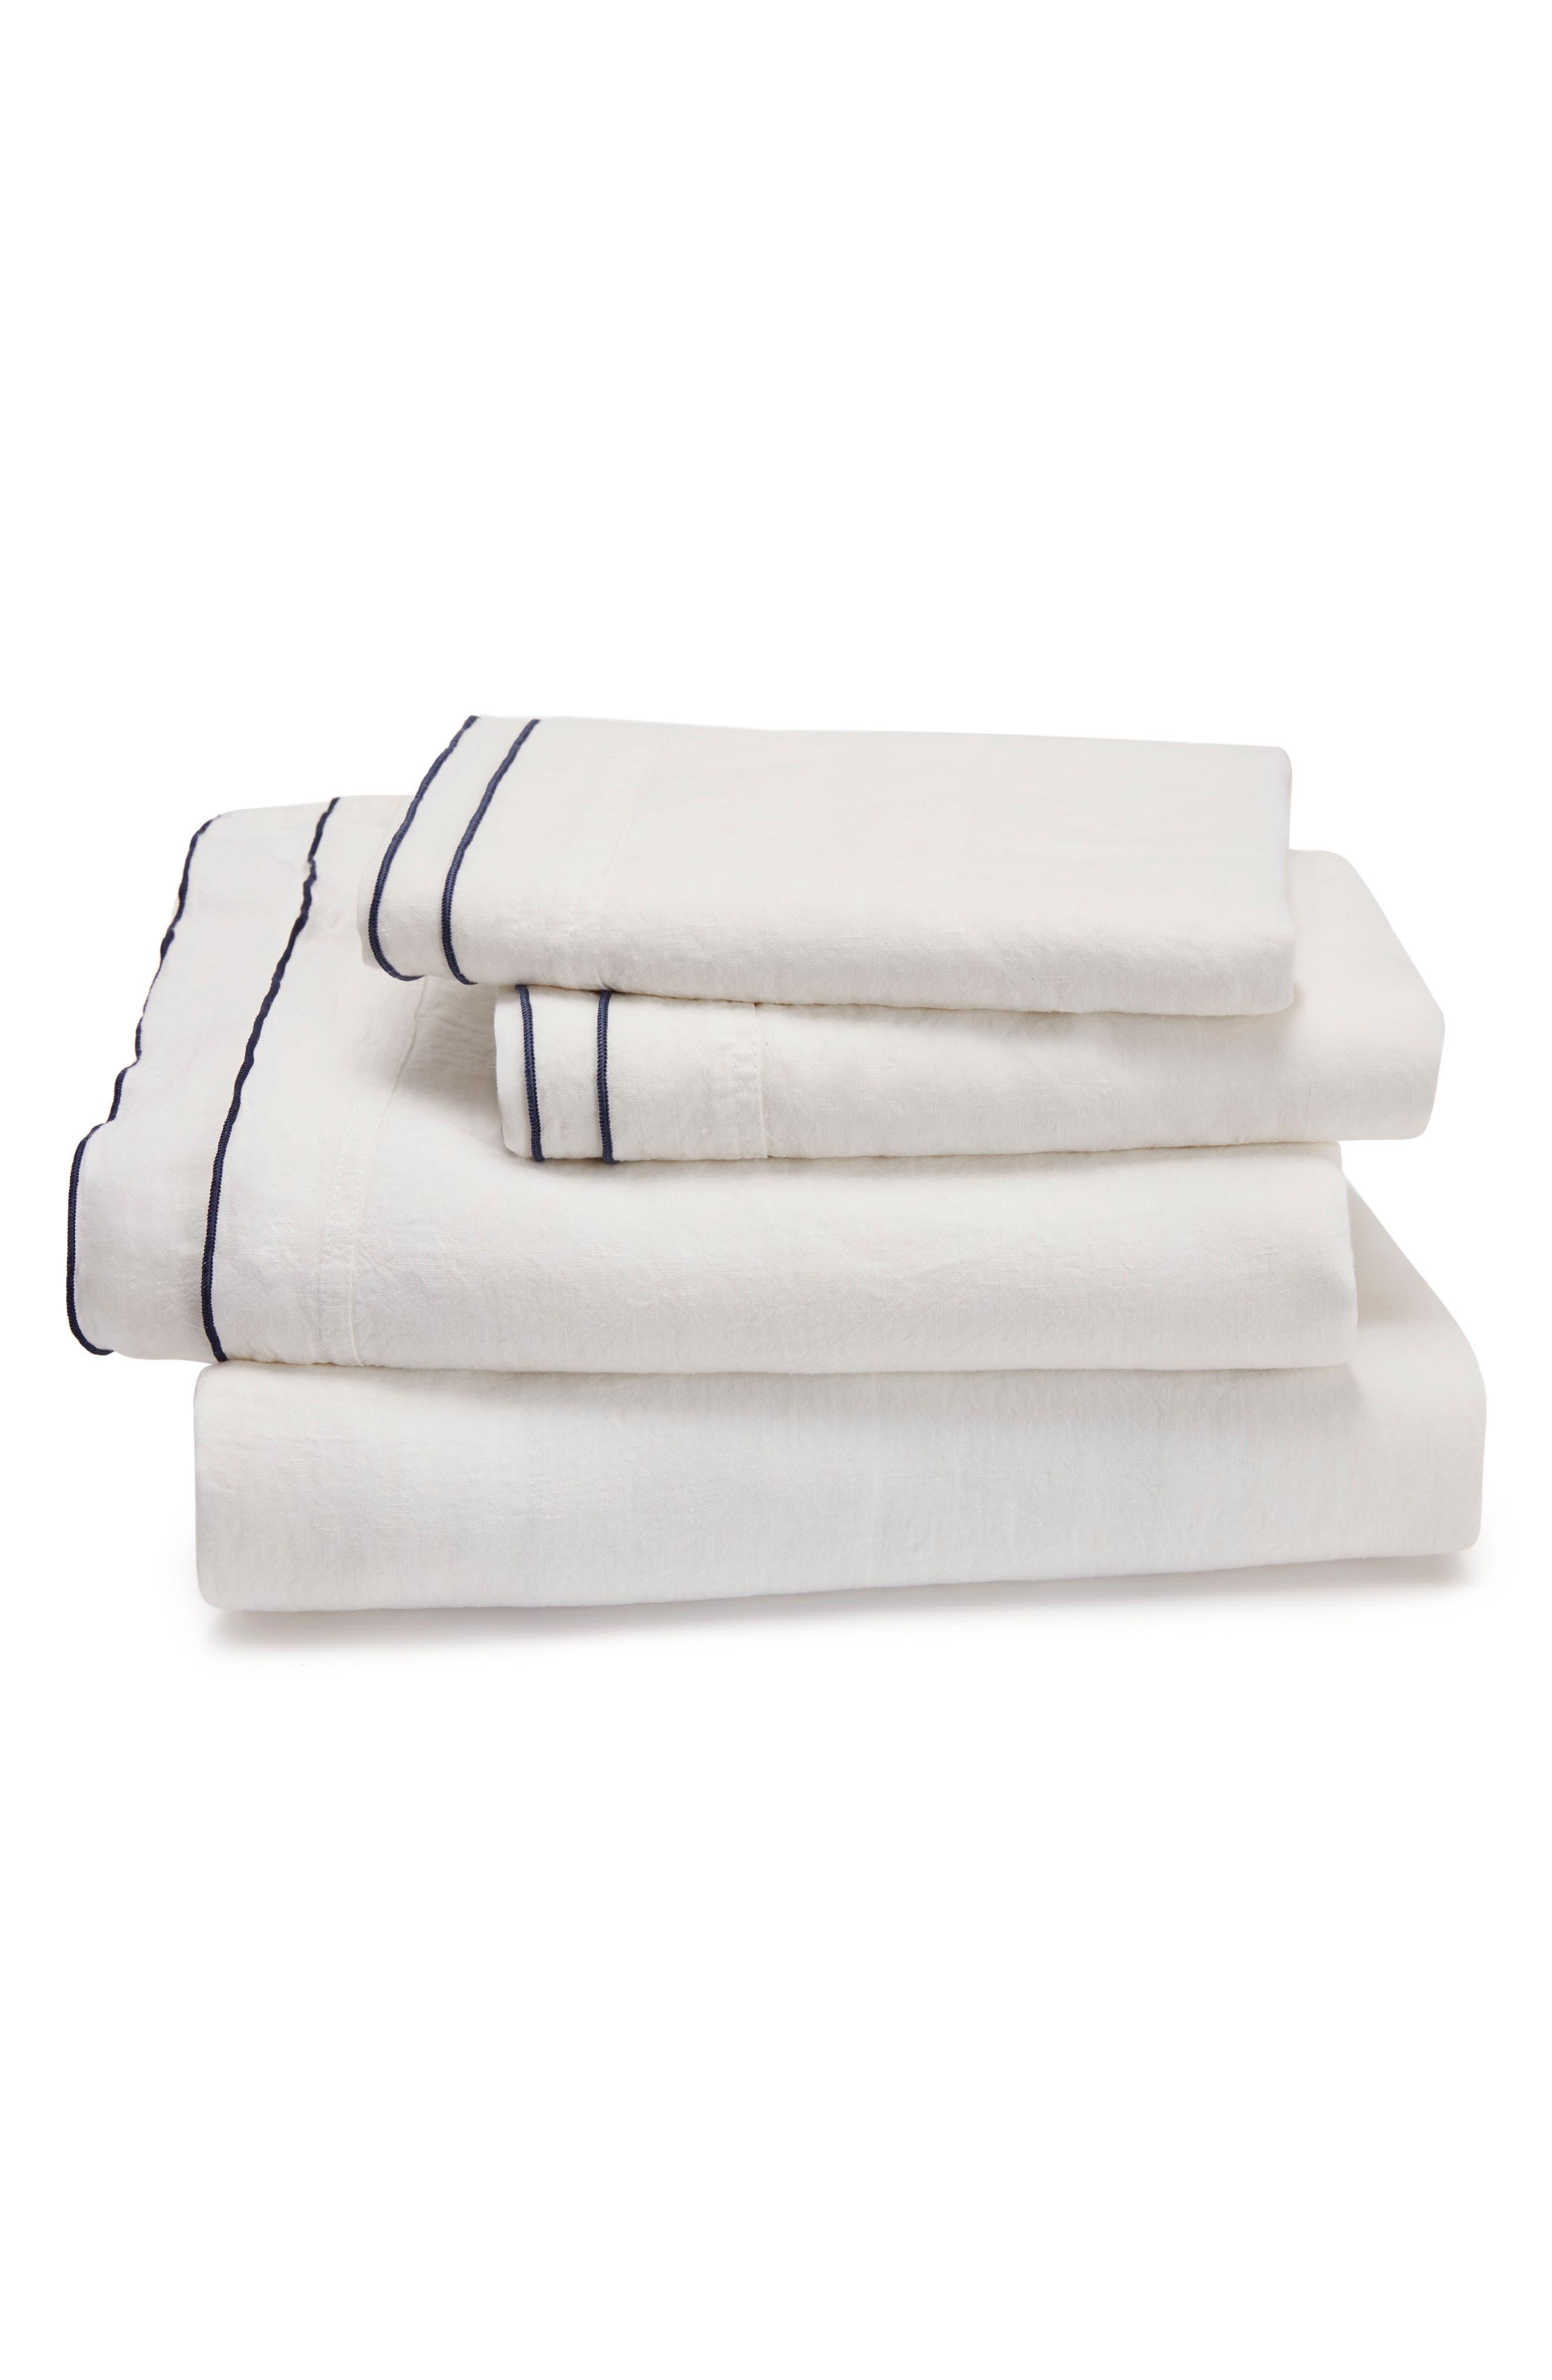 Biarritz Linen 300 Thread Count Pillowcase,                             Main thumbnail 1, color,                             100